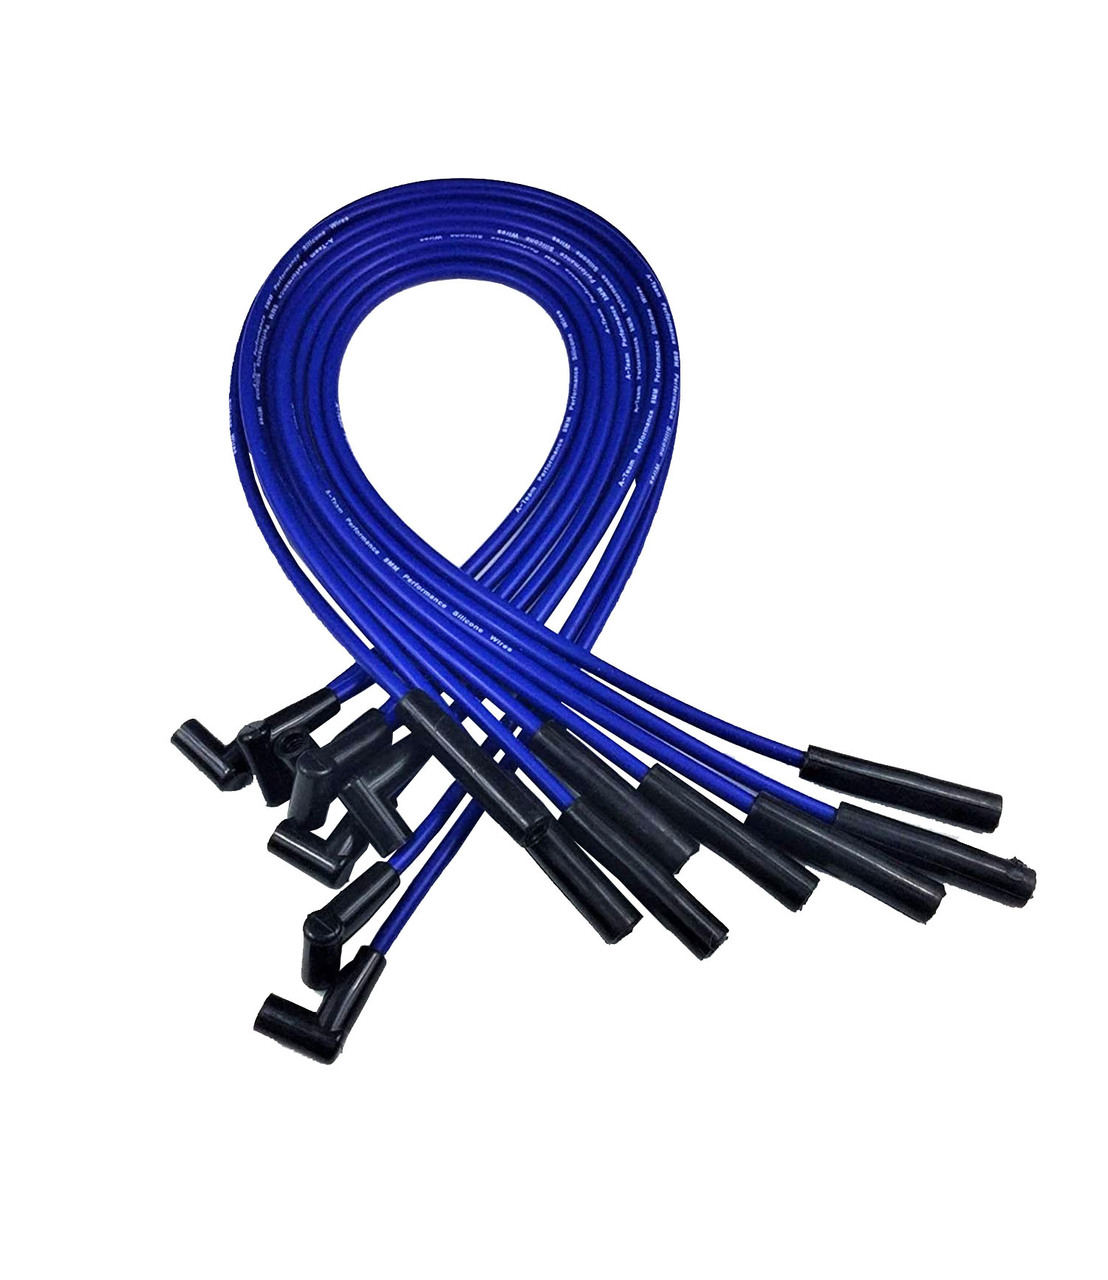 SILICONE PLUG WIRE FORD BIG BLOCK 351C-429-460 BLUE Small Cap HEI Distributor